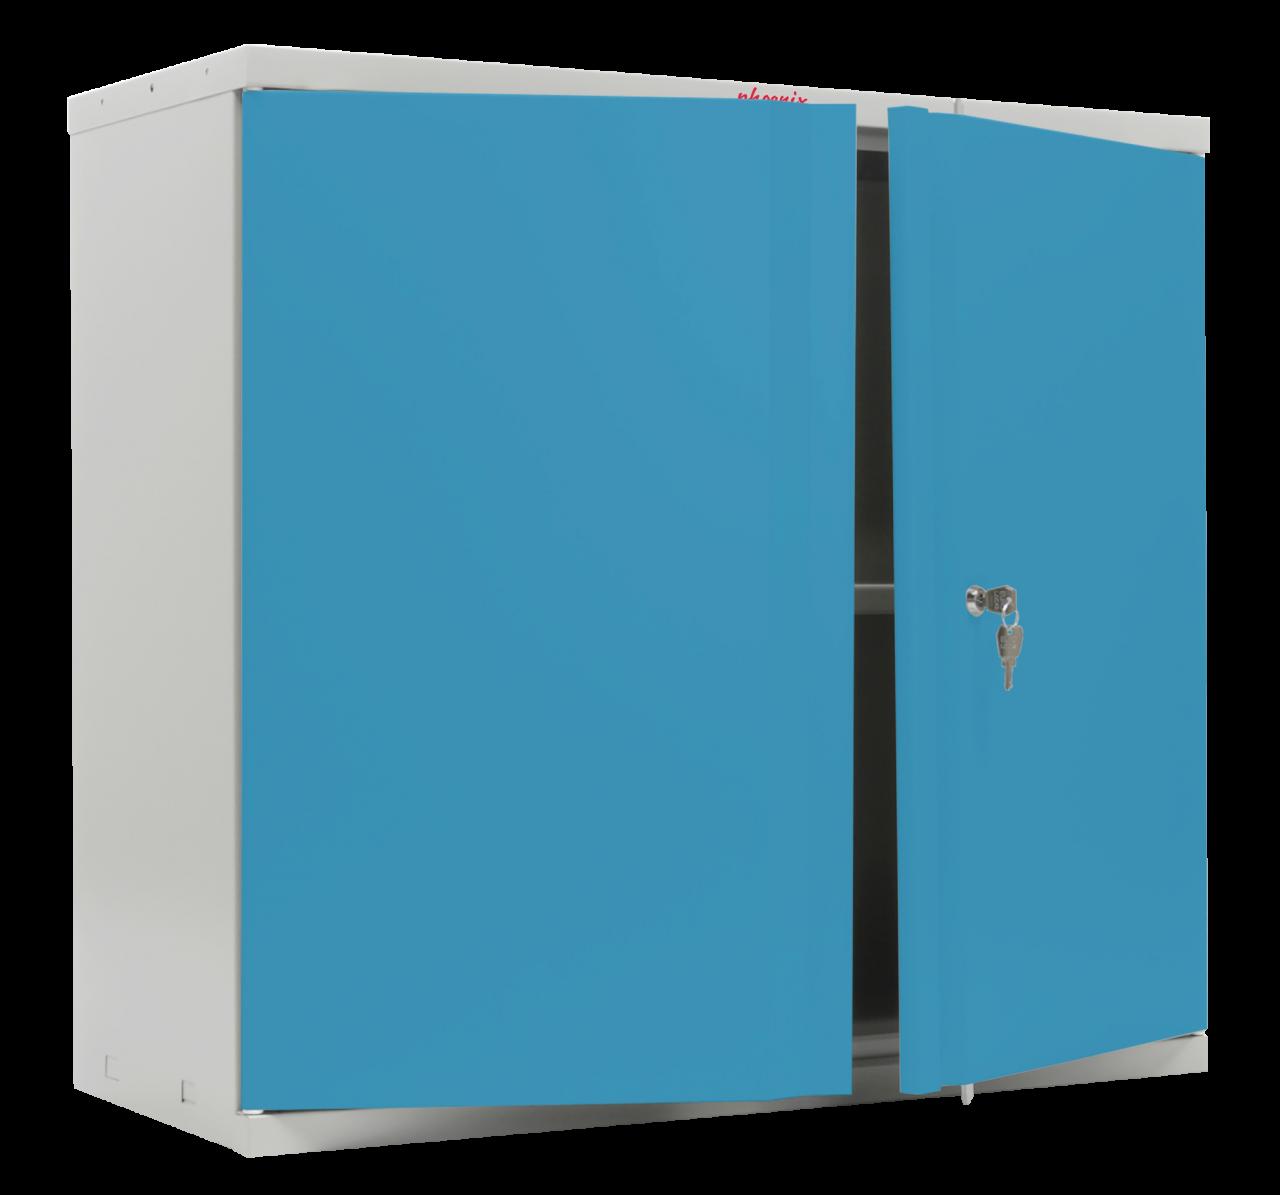 produkt-bild-stahlschrank-scl-serie-blau-s